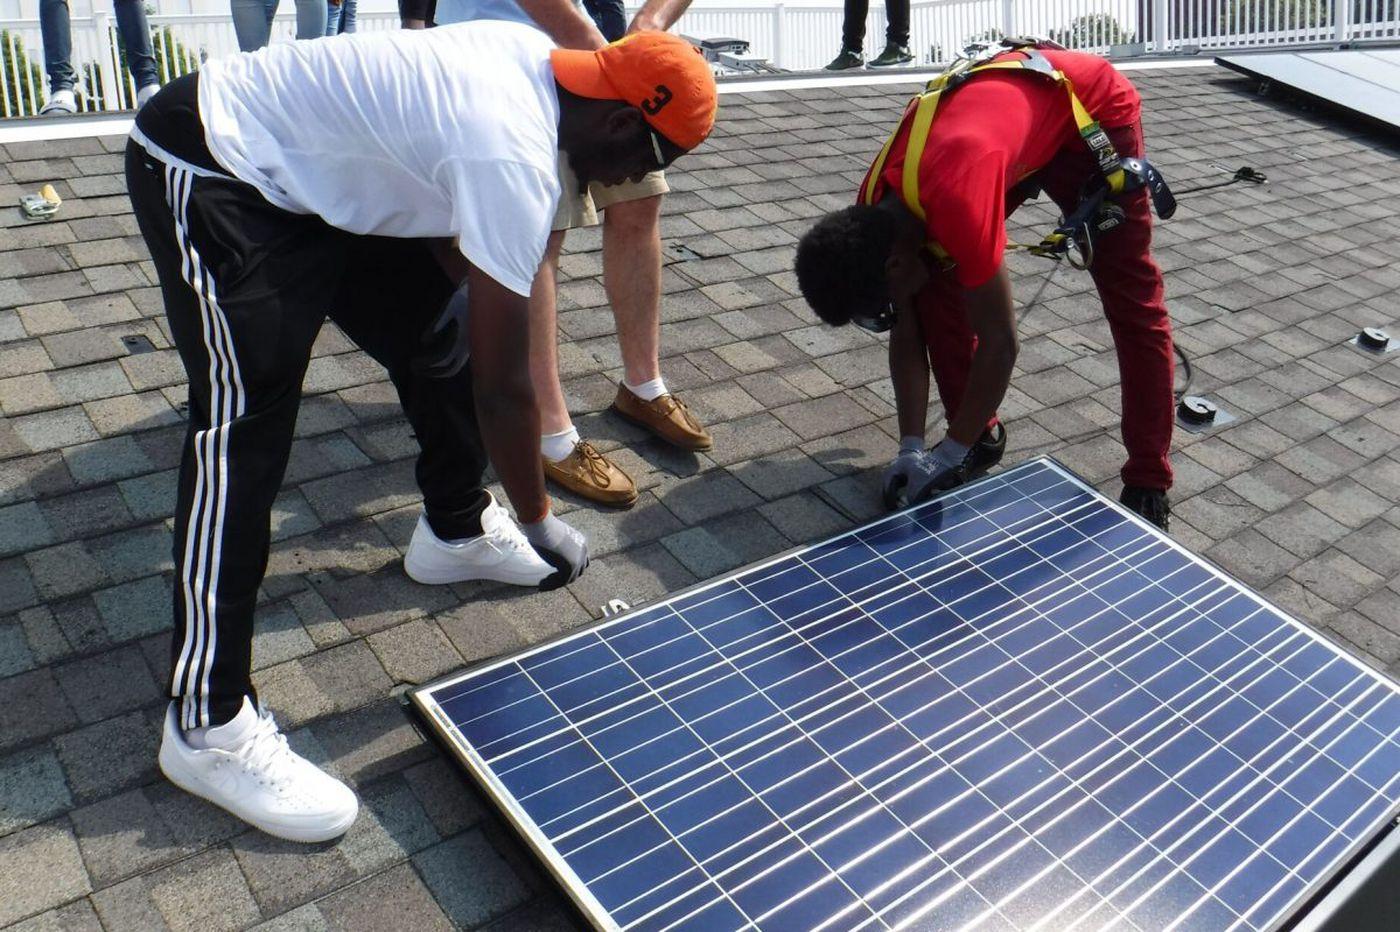 Meet the graduates of Philly School District's first solar training program